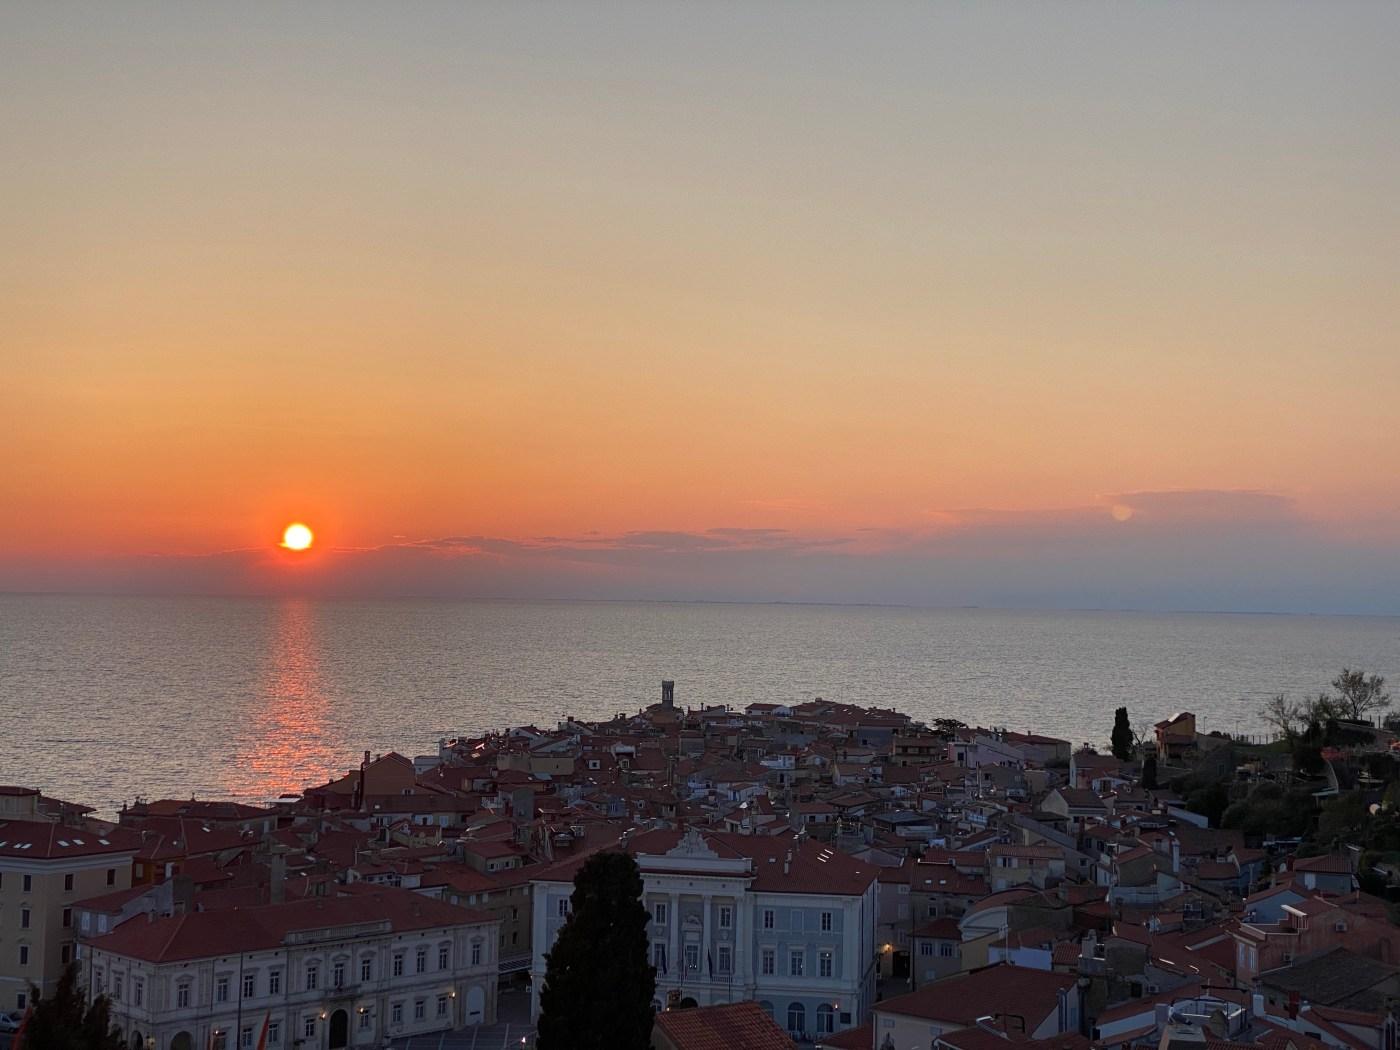 sunset, town